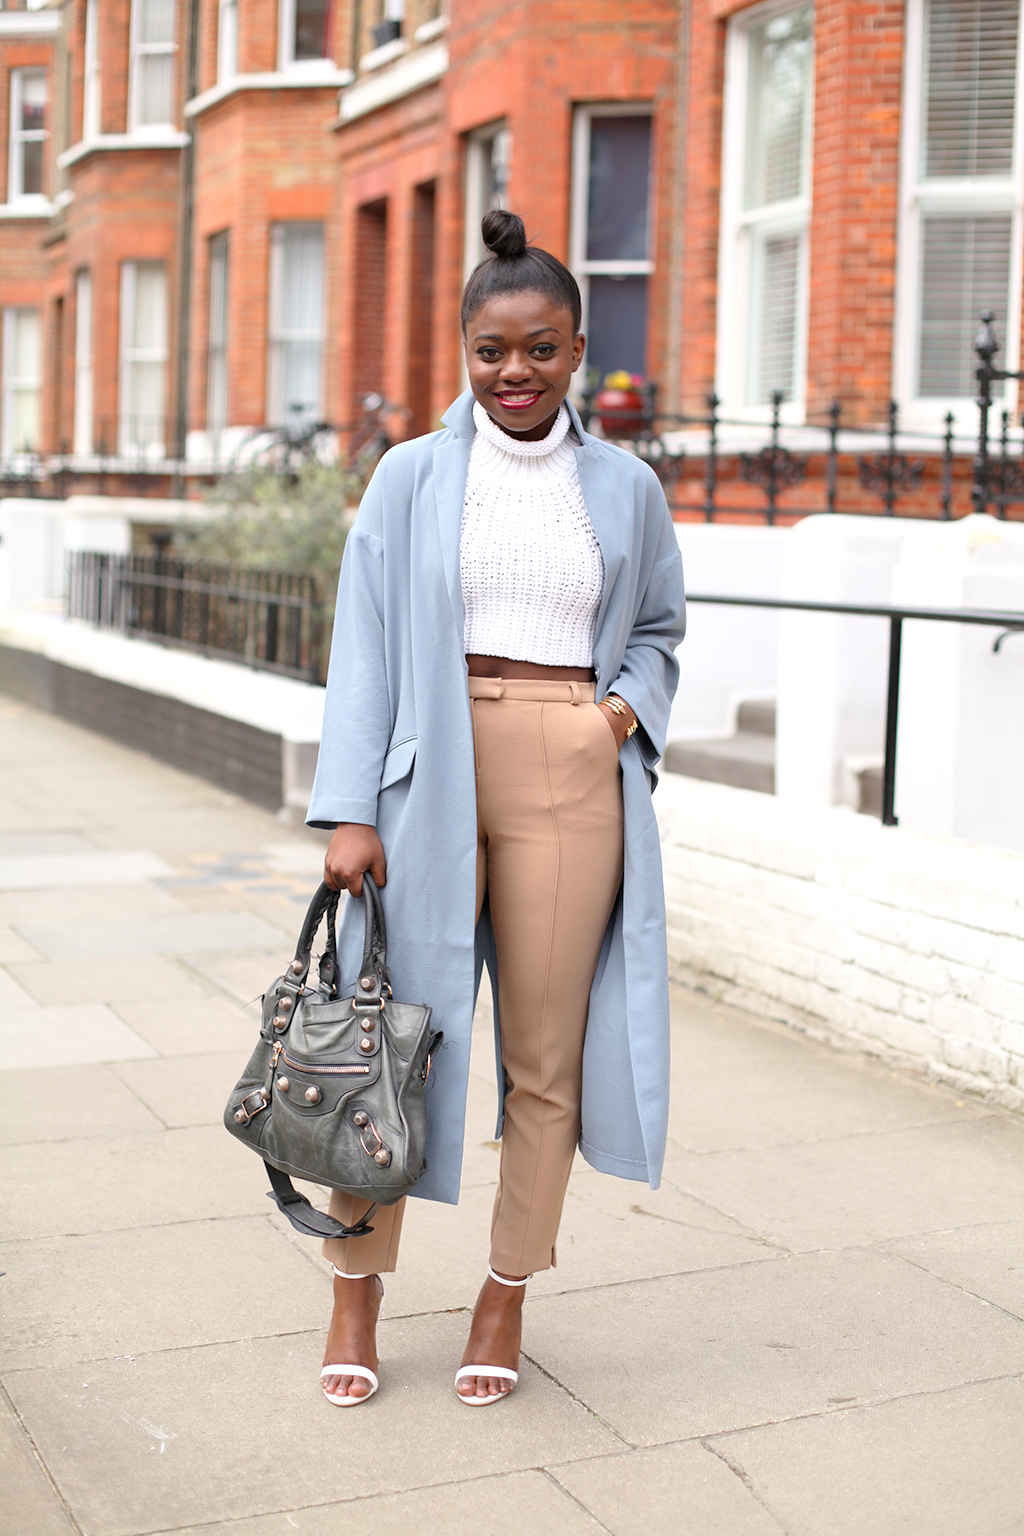 Image result for black blogger in duster coat